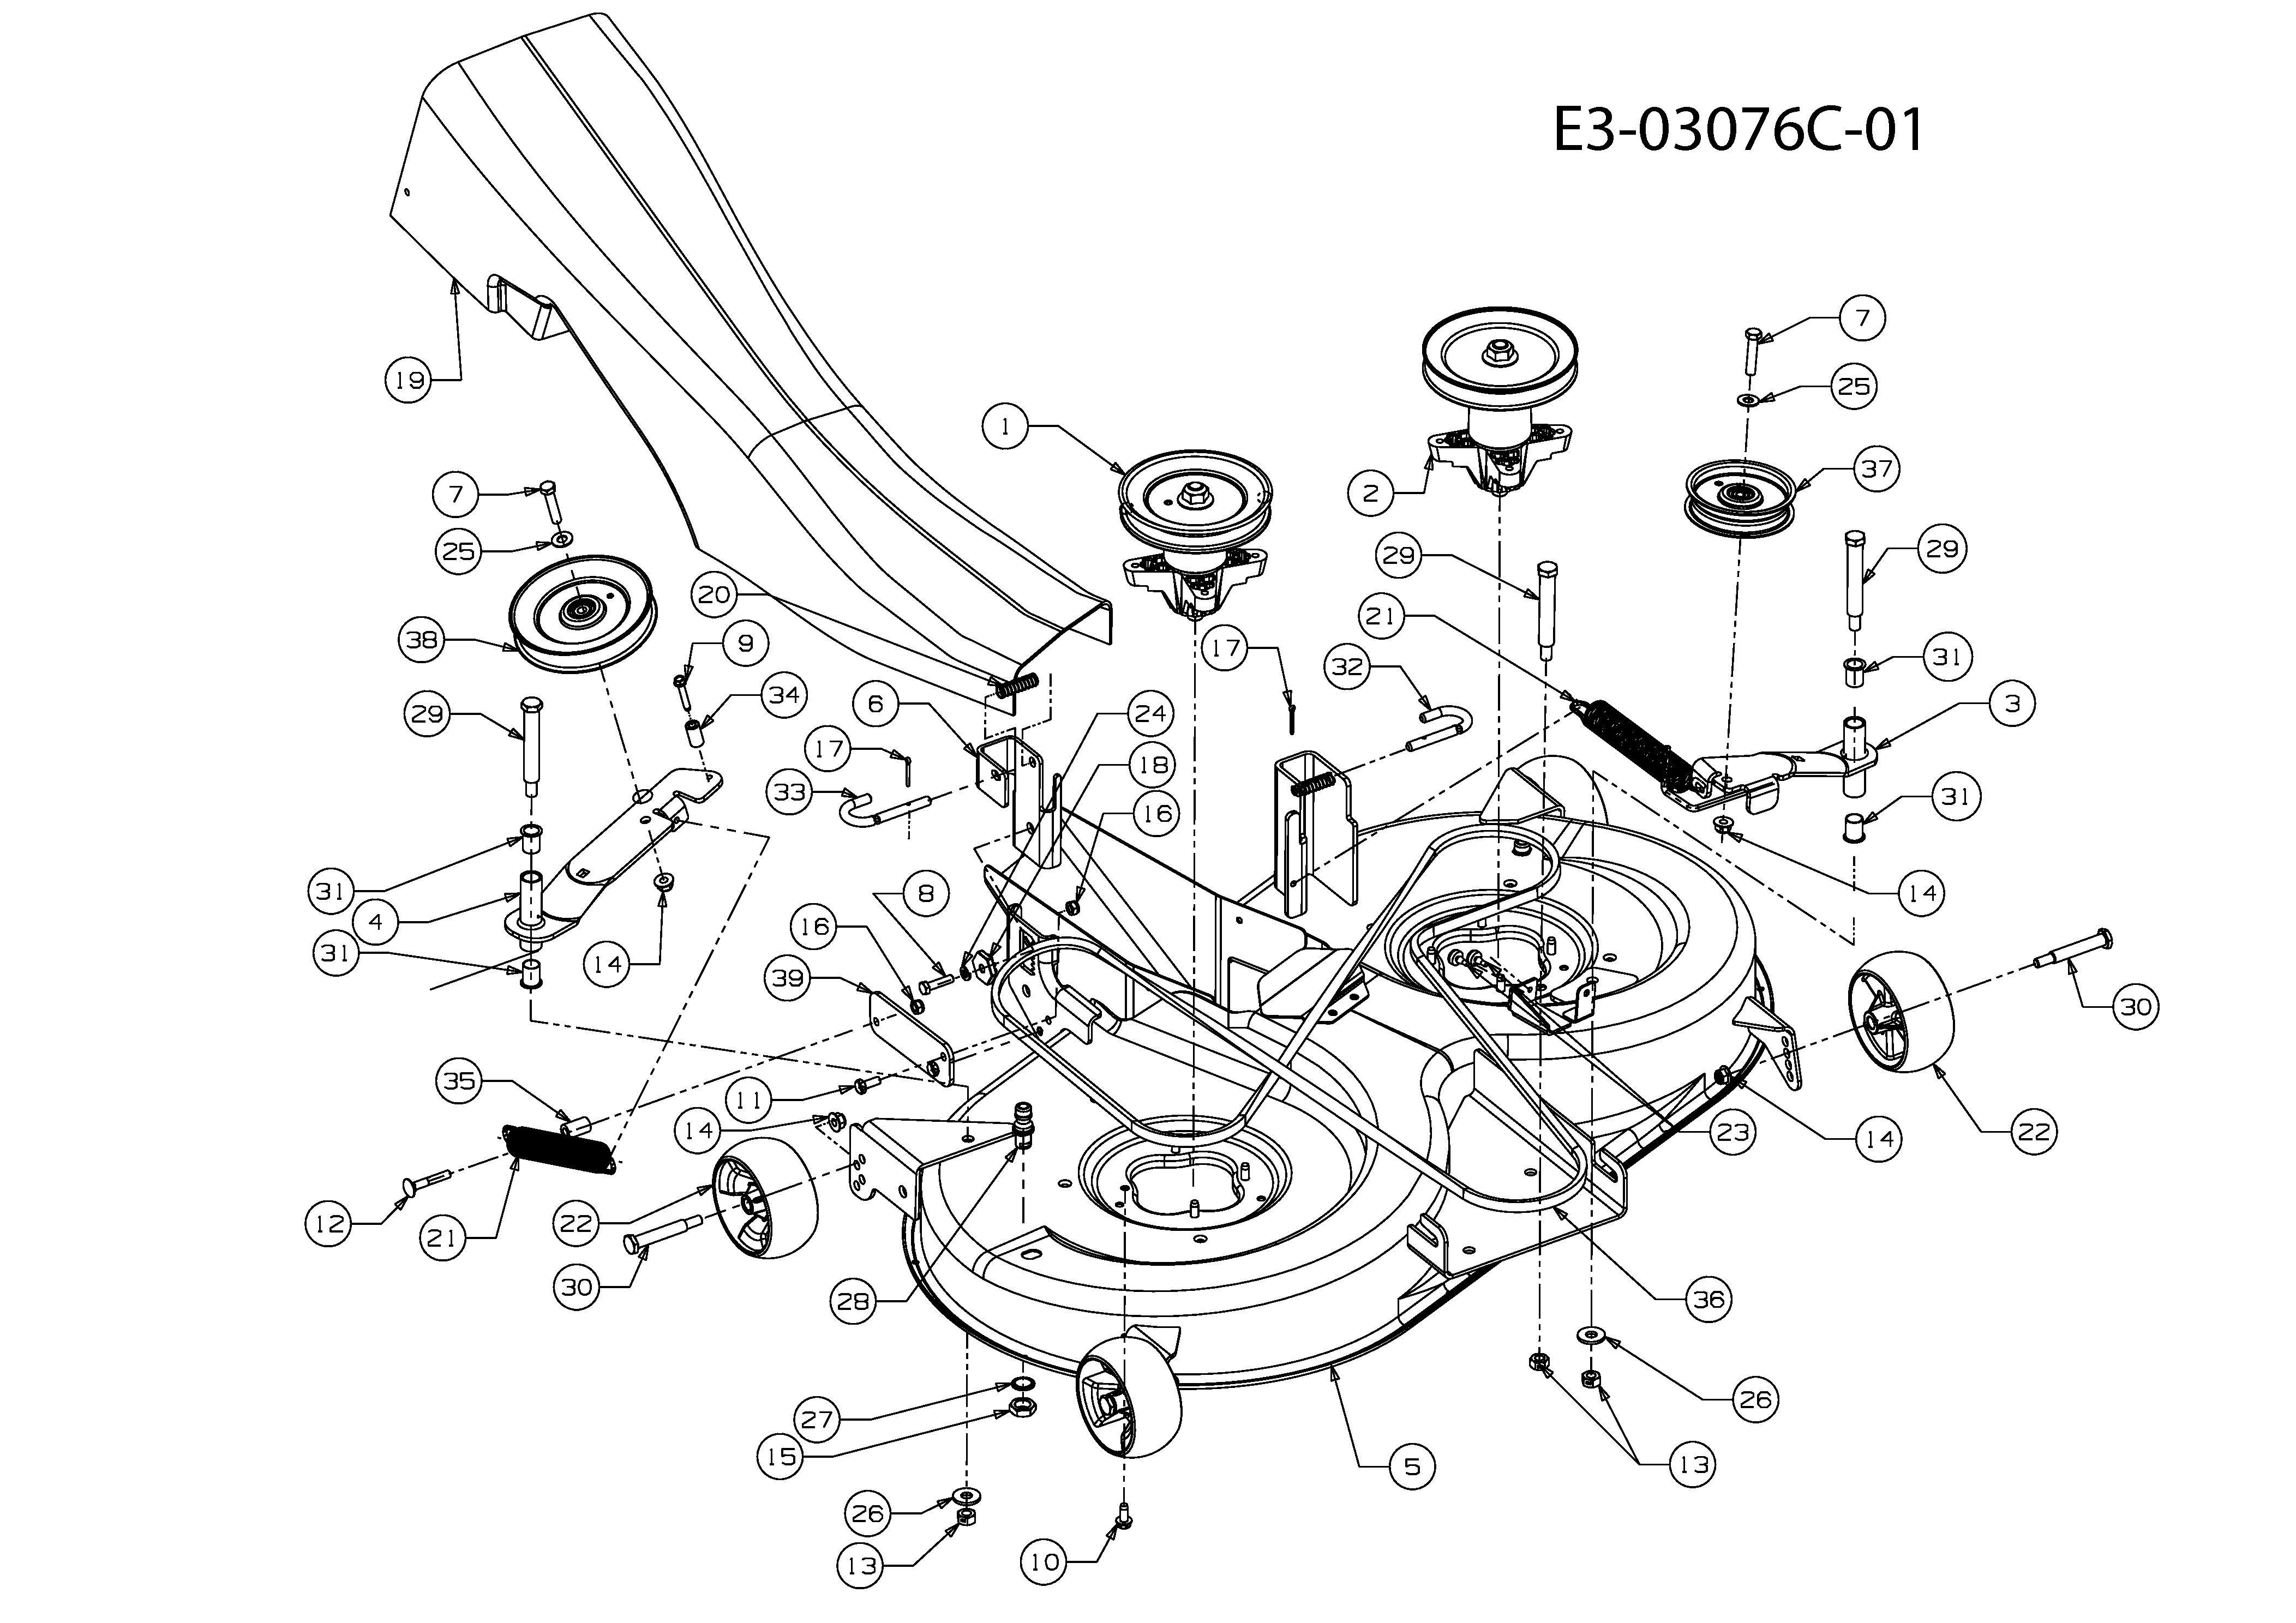 Keilriemen Mähwerk passend MTD JN 175 H 13BN493N676 Rasentraktor